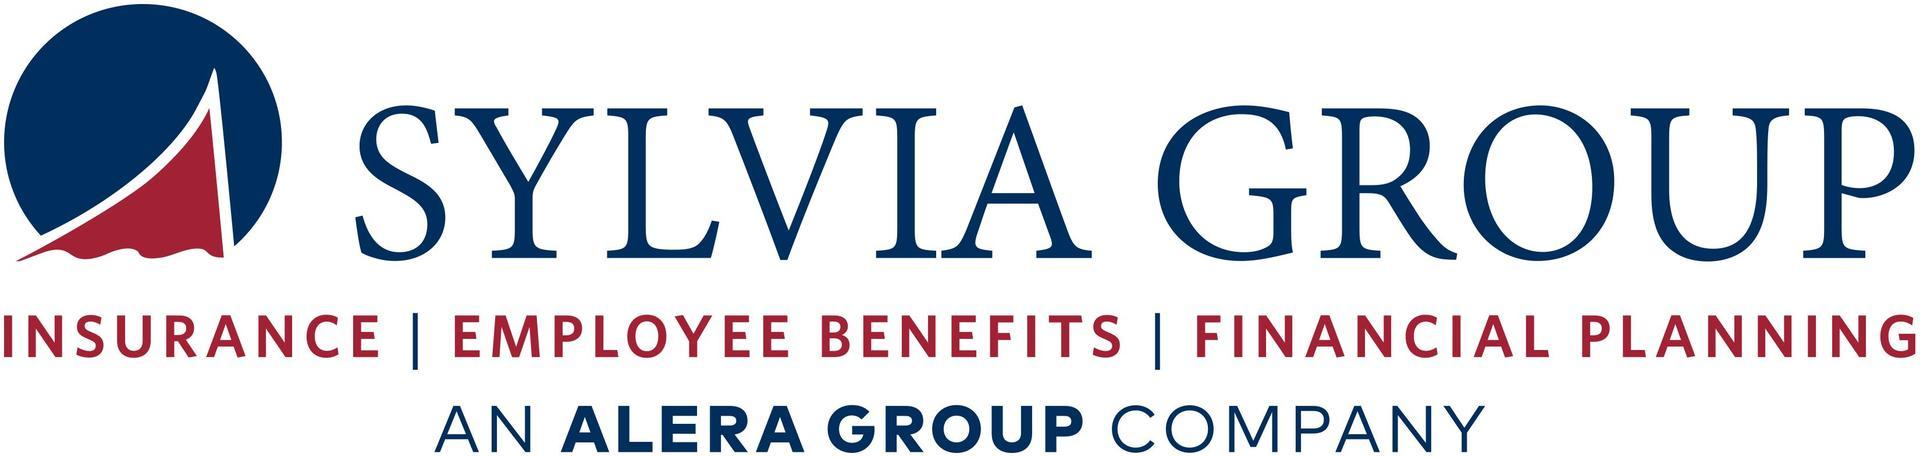 Silvia Group Insurance